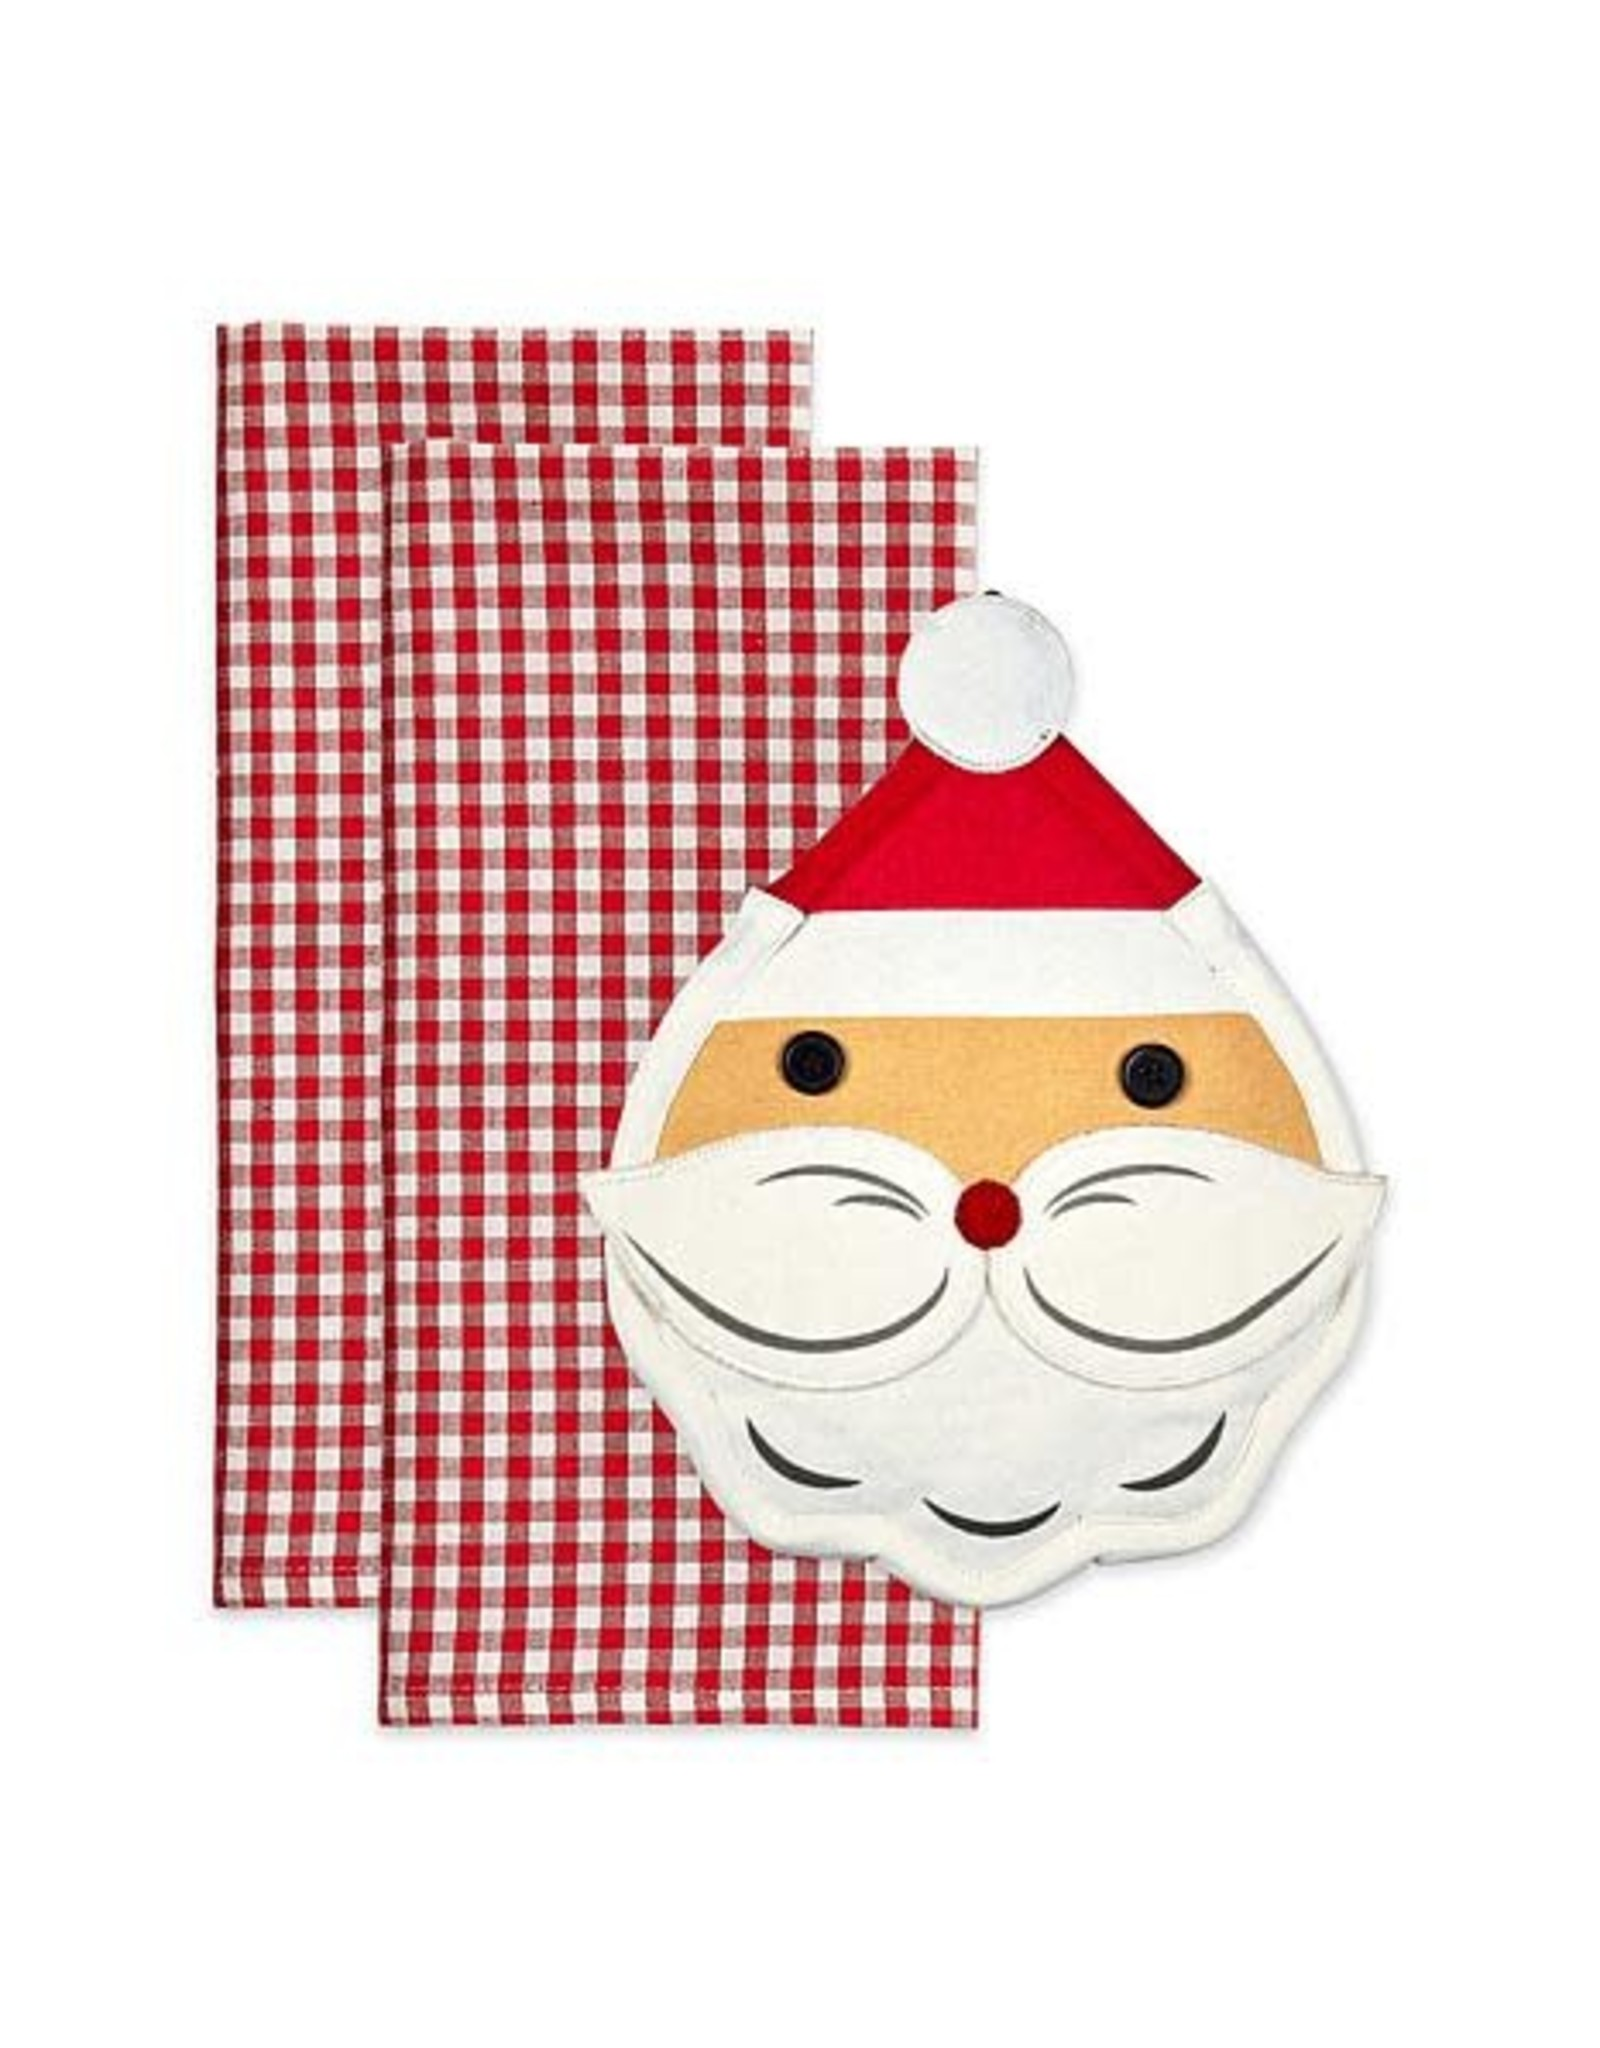 Design Imports DI Jolly Santa Potholder Gift Set